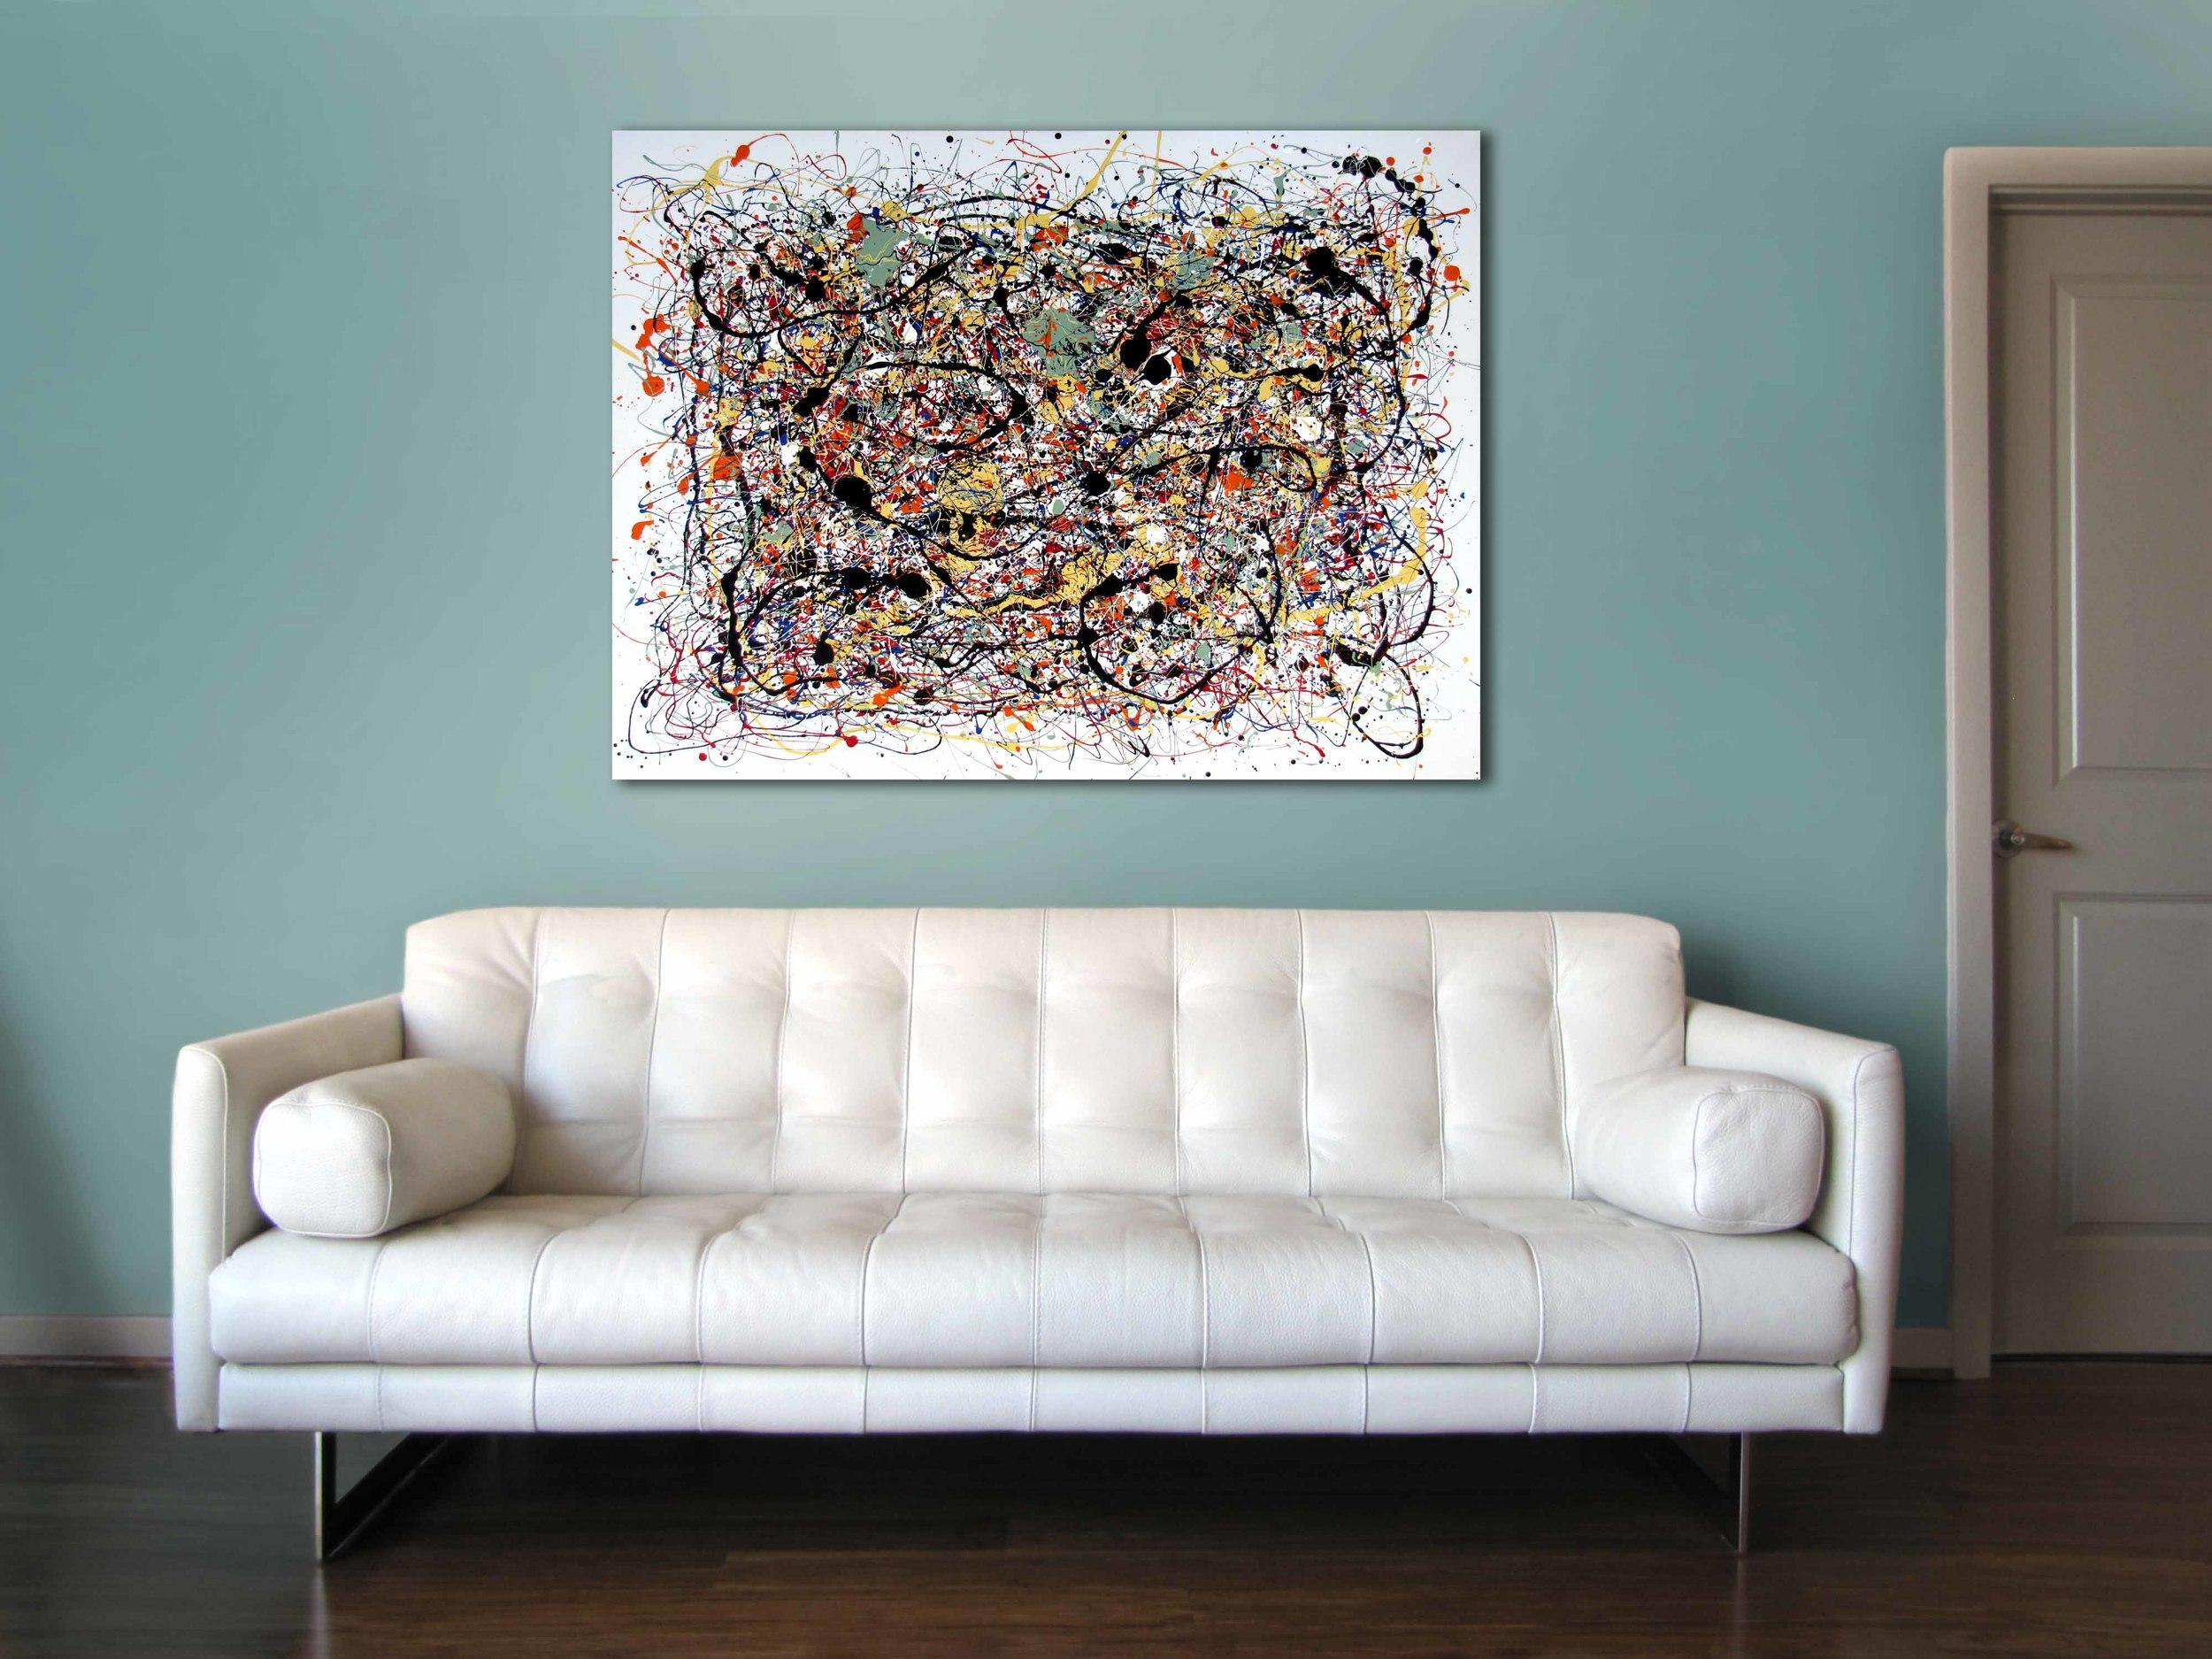 Sofa Wall i am light cyan 2.jpg